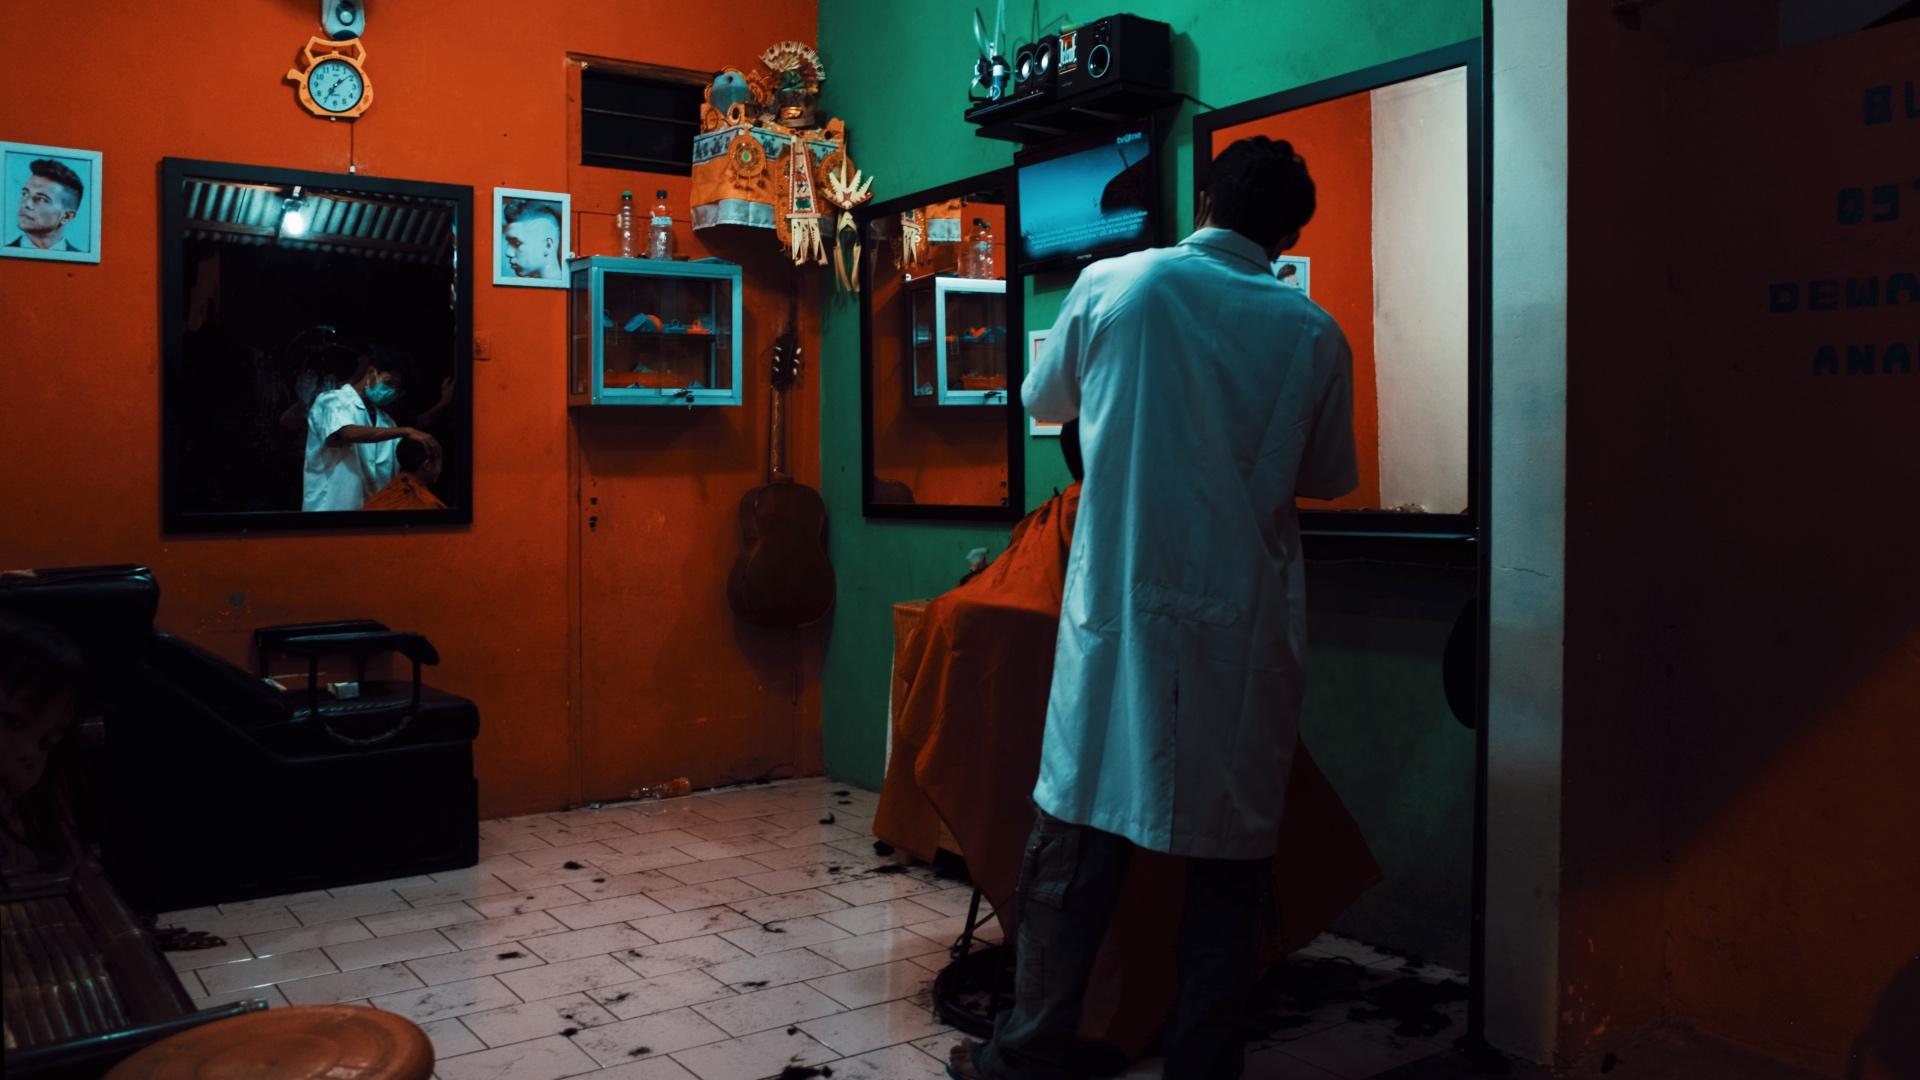 bali haircut by jevgenij tichonov.JPG